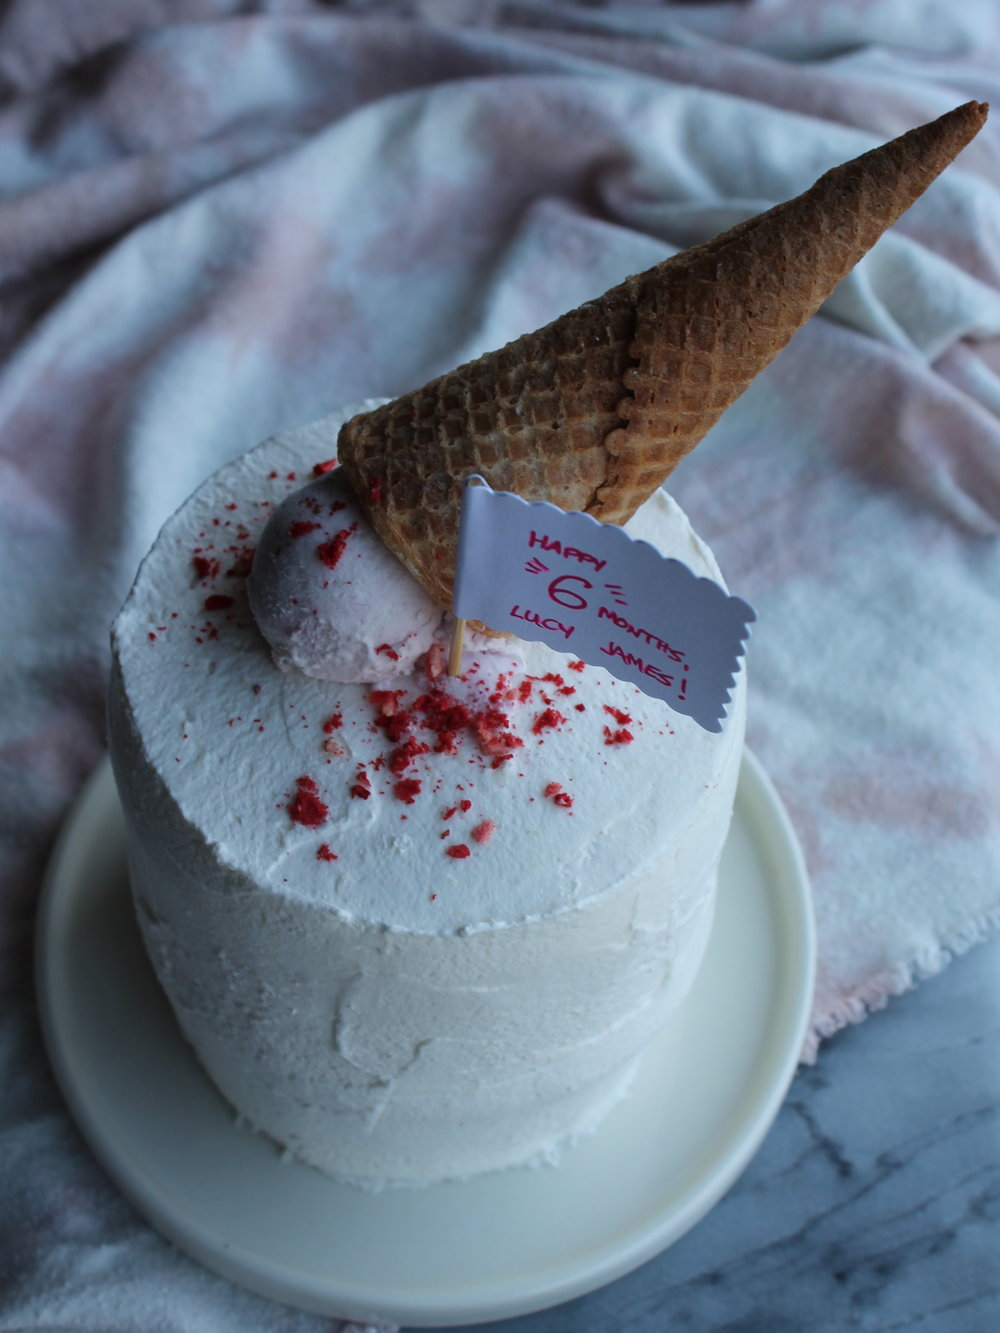 Neapolitan Ice Cream Cake with Ice cream cone topper